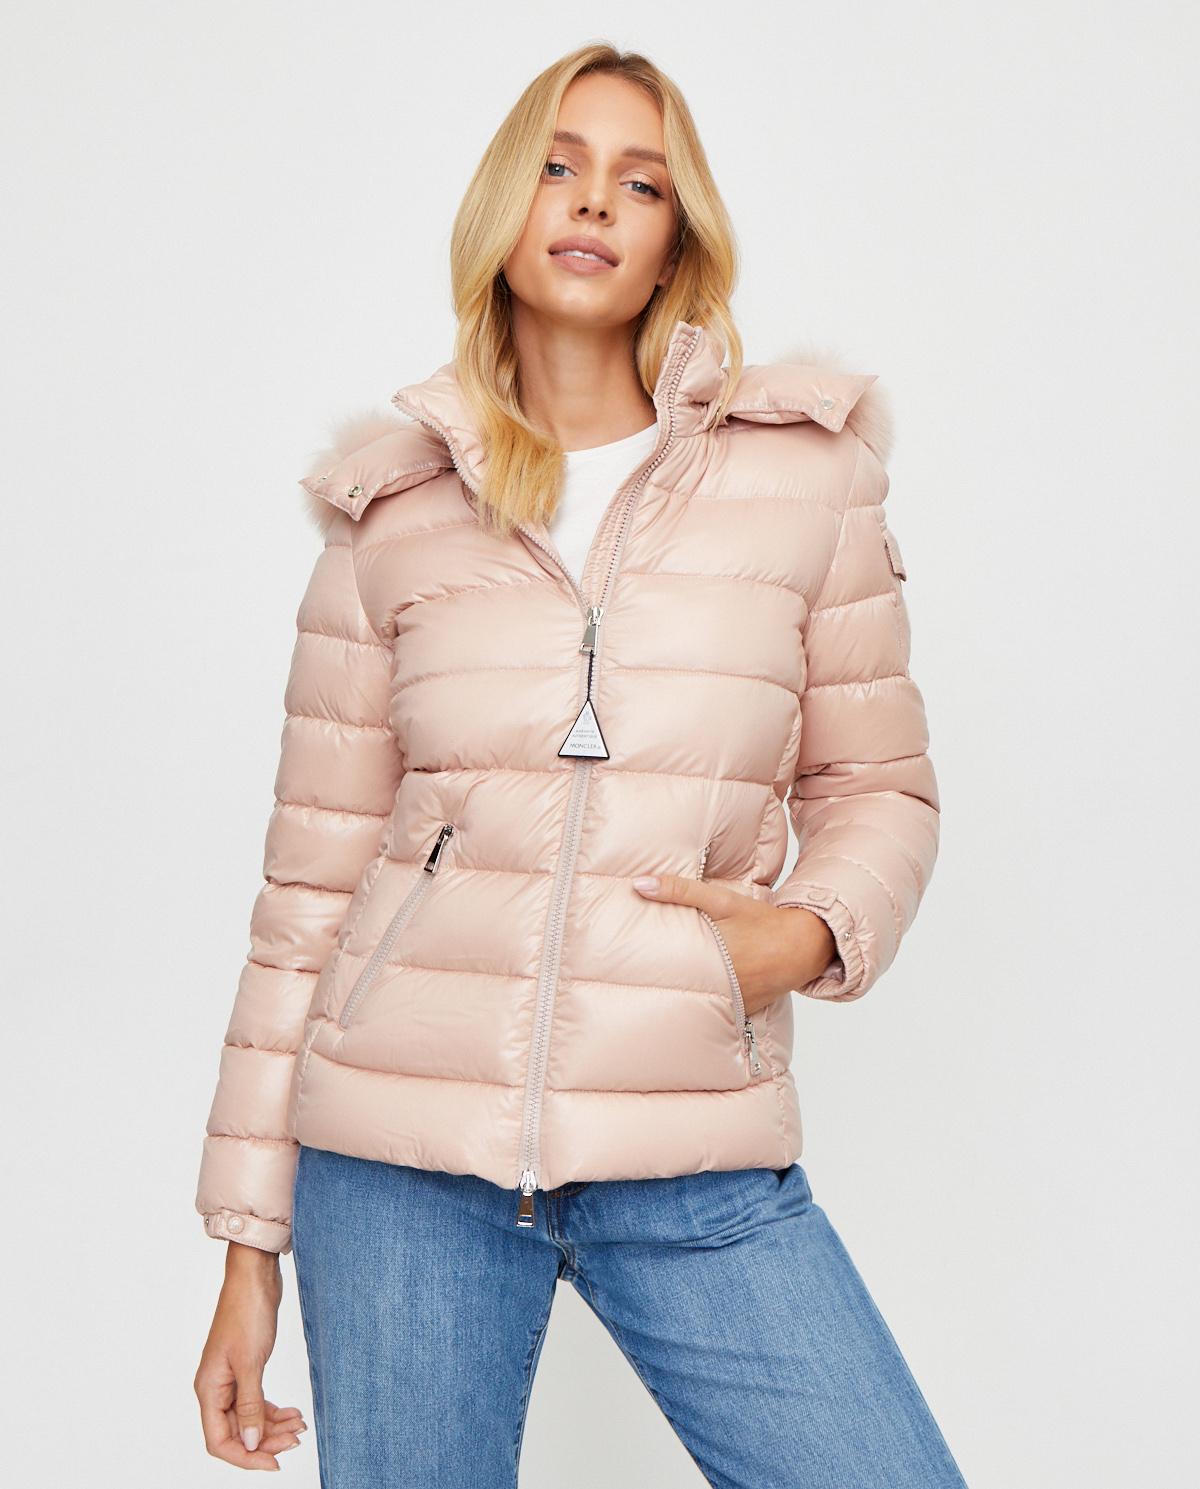 Różowa kurtka Badyfur Moncler F2-093-1A540-02-C0064 512